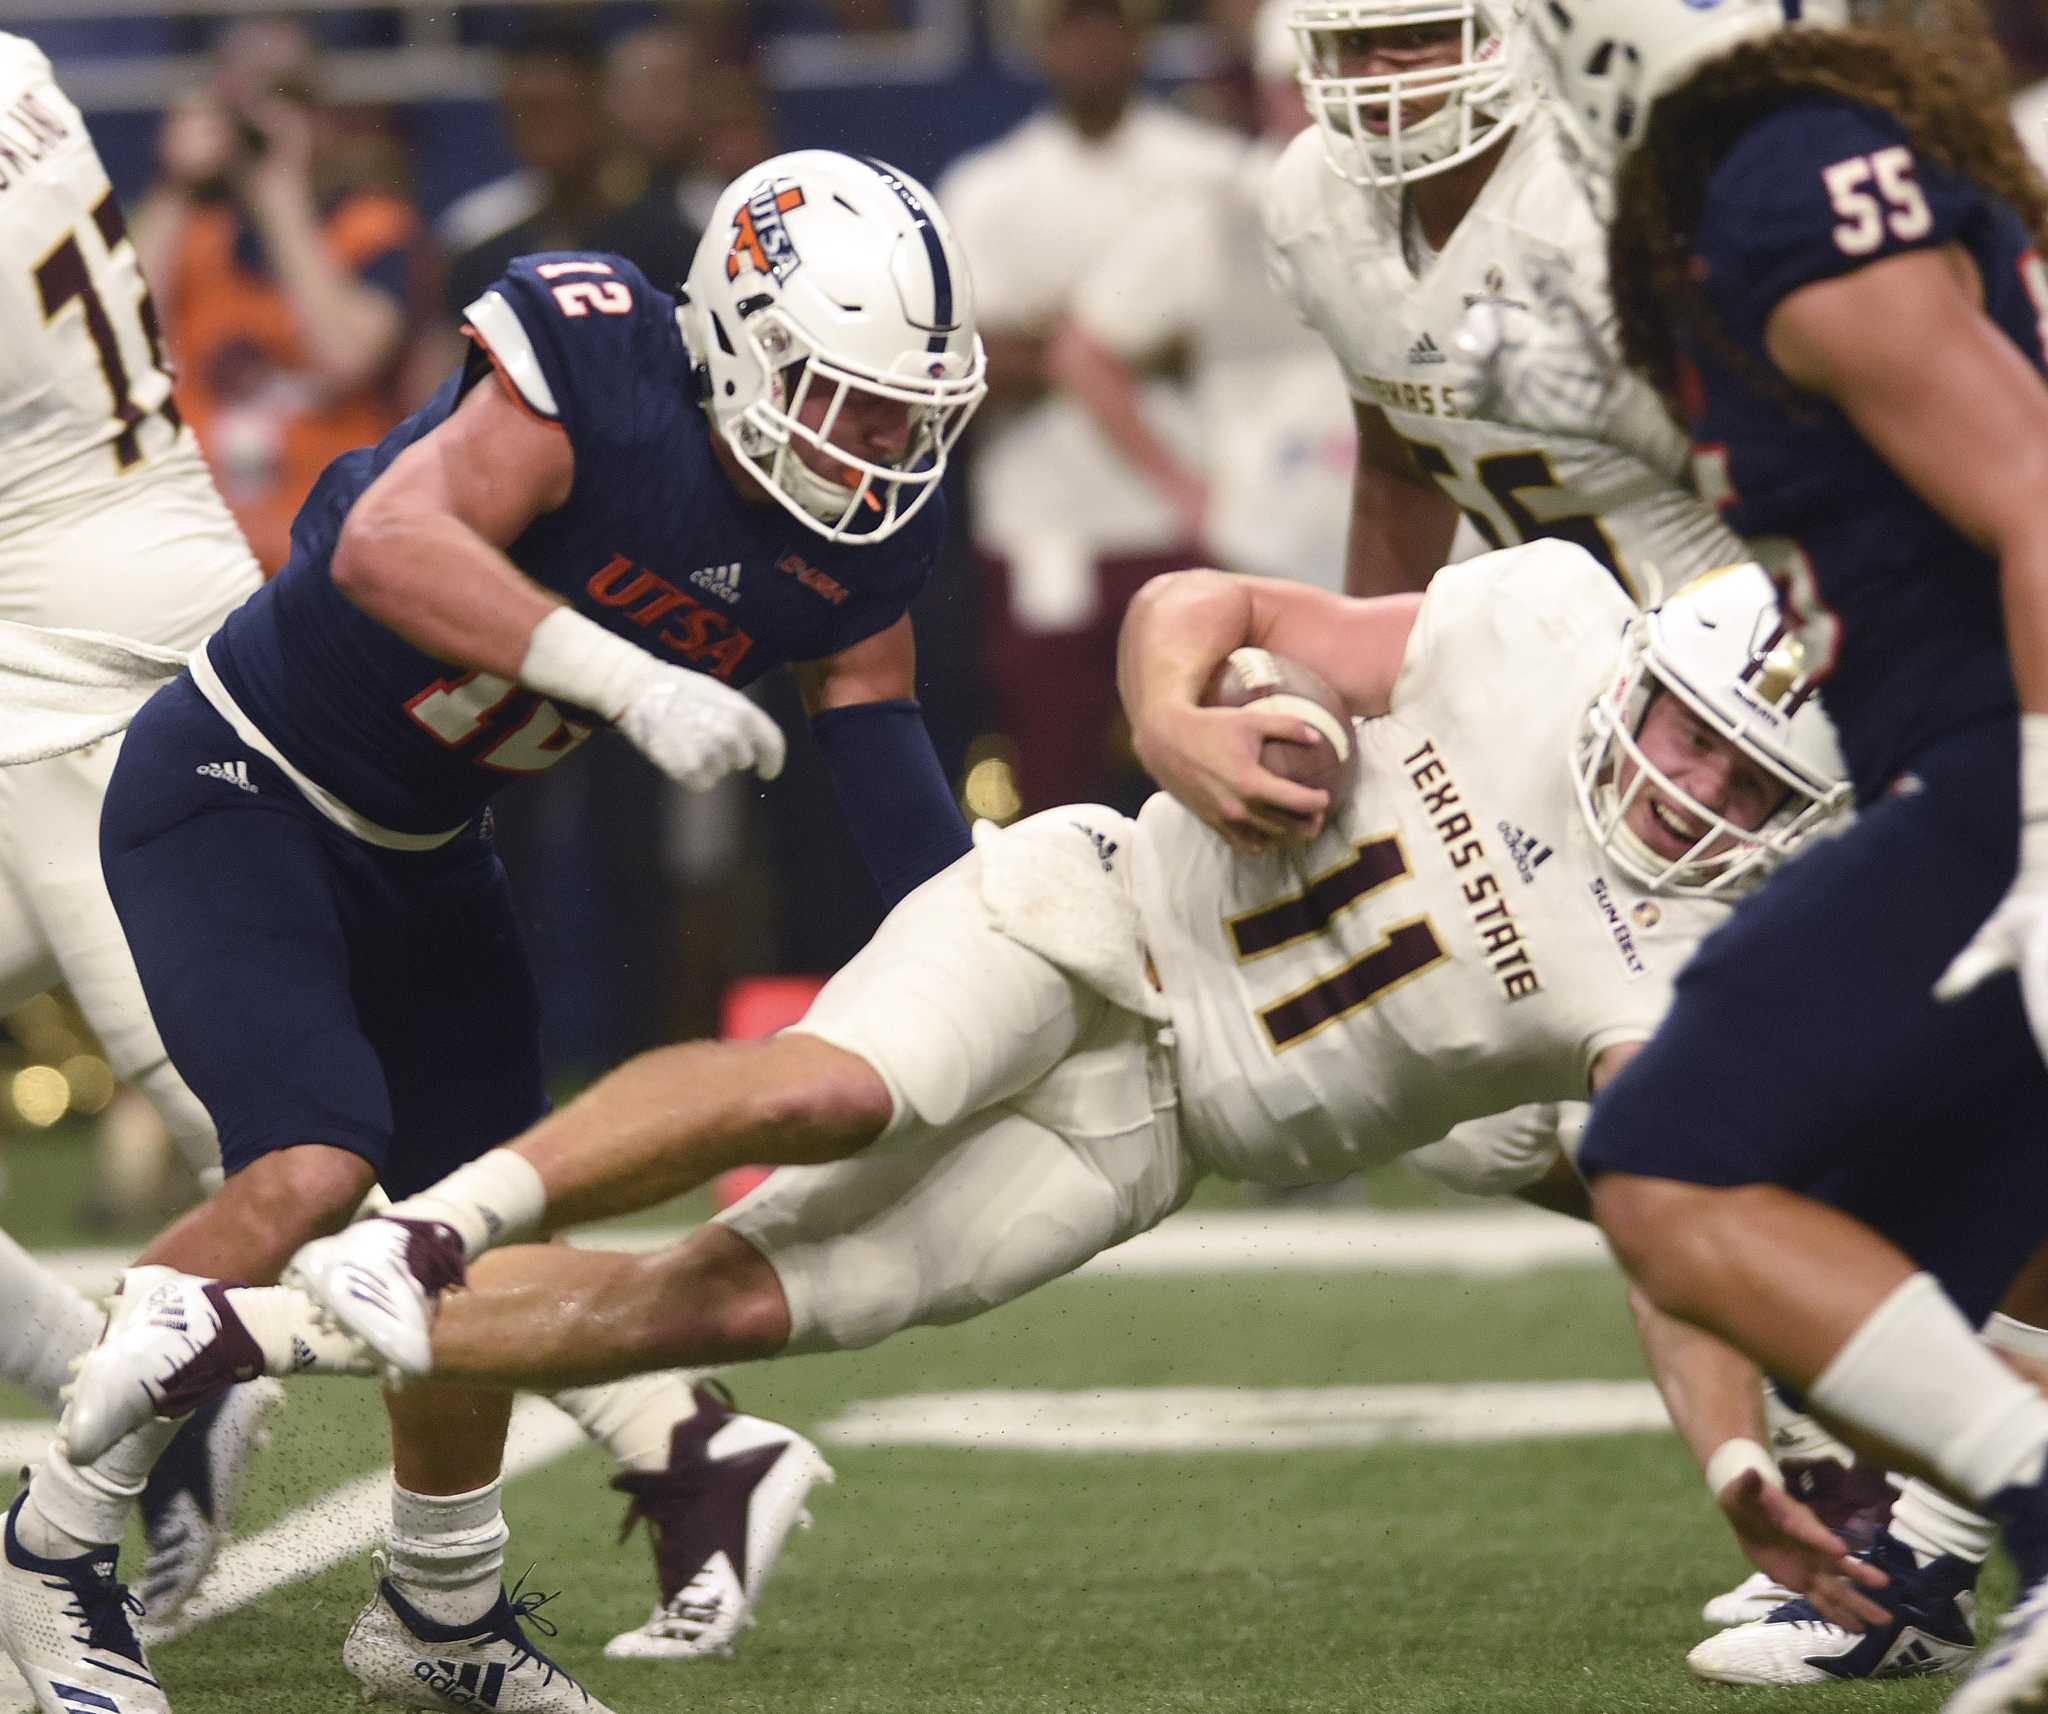 Freshman Quarterback Vitt Leads Texas State Into Thursday